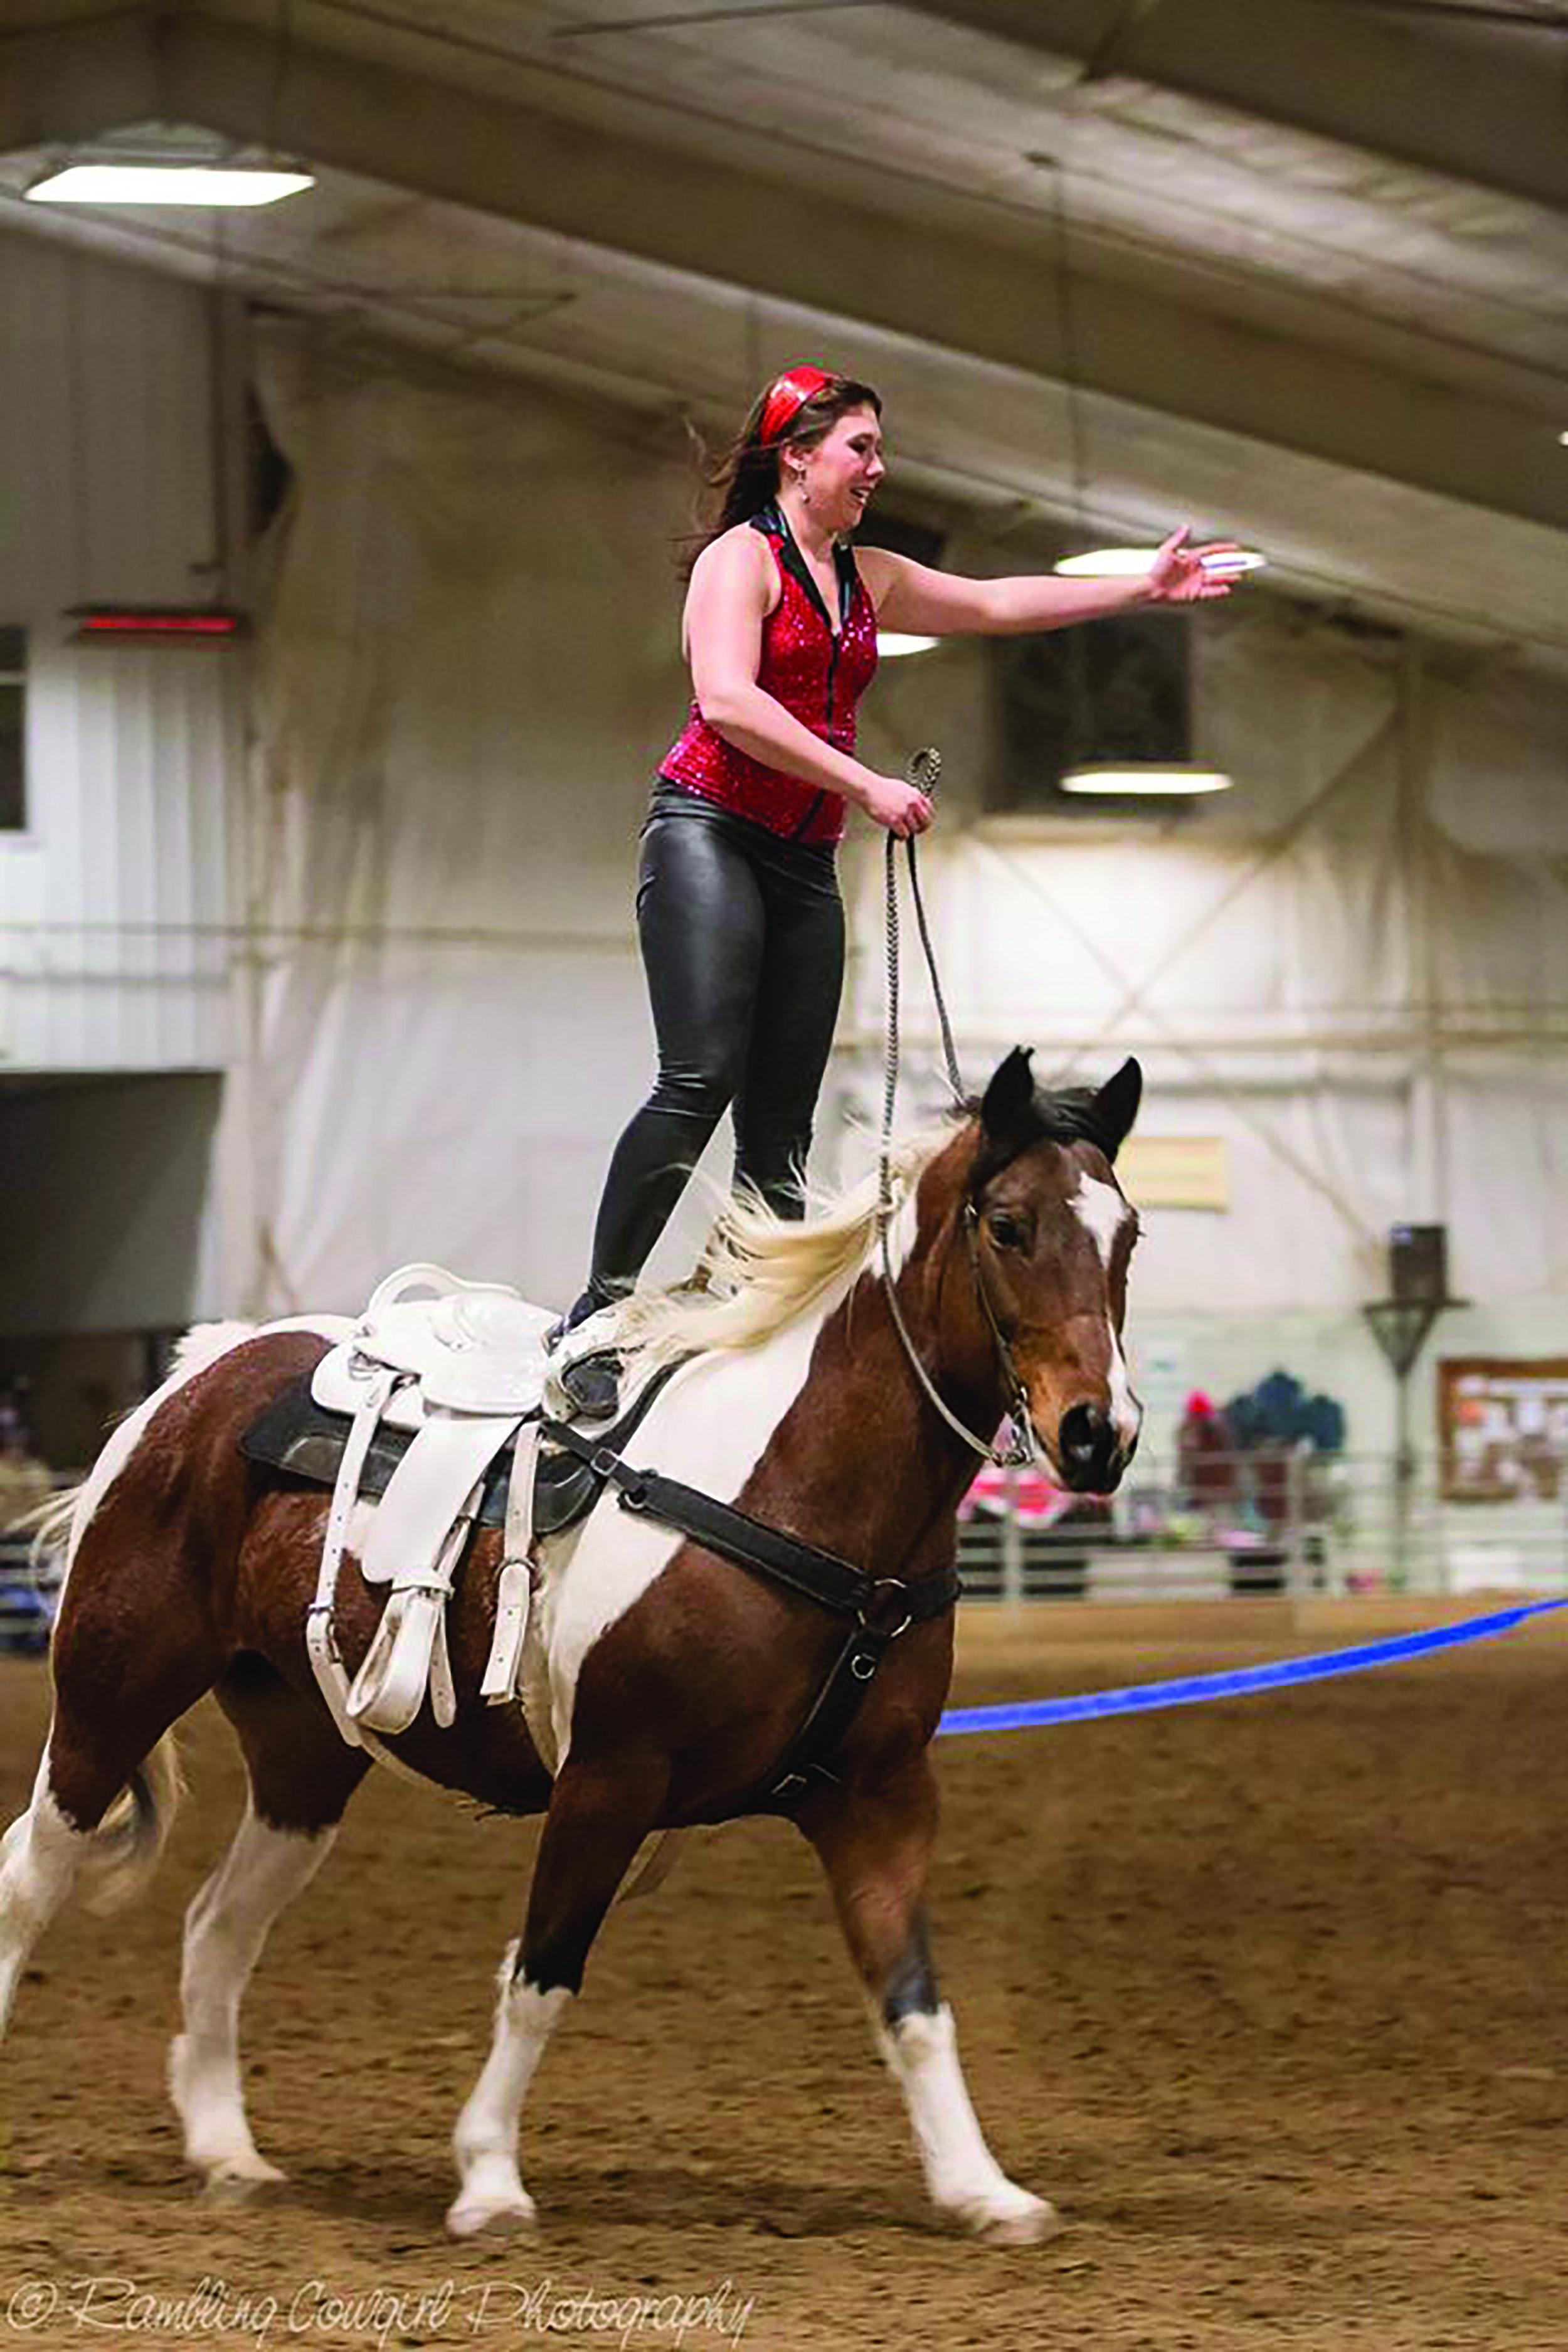 Ashley Pletcher Trick Riding